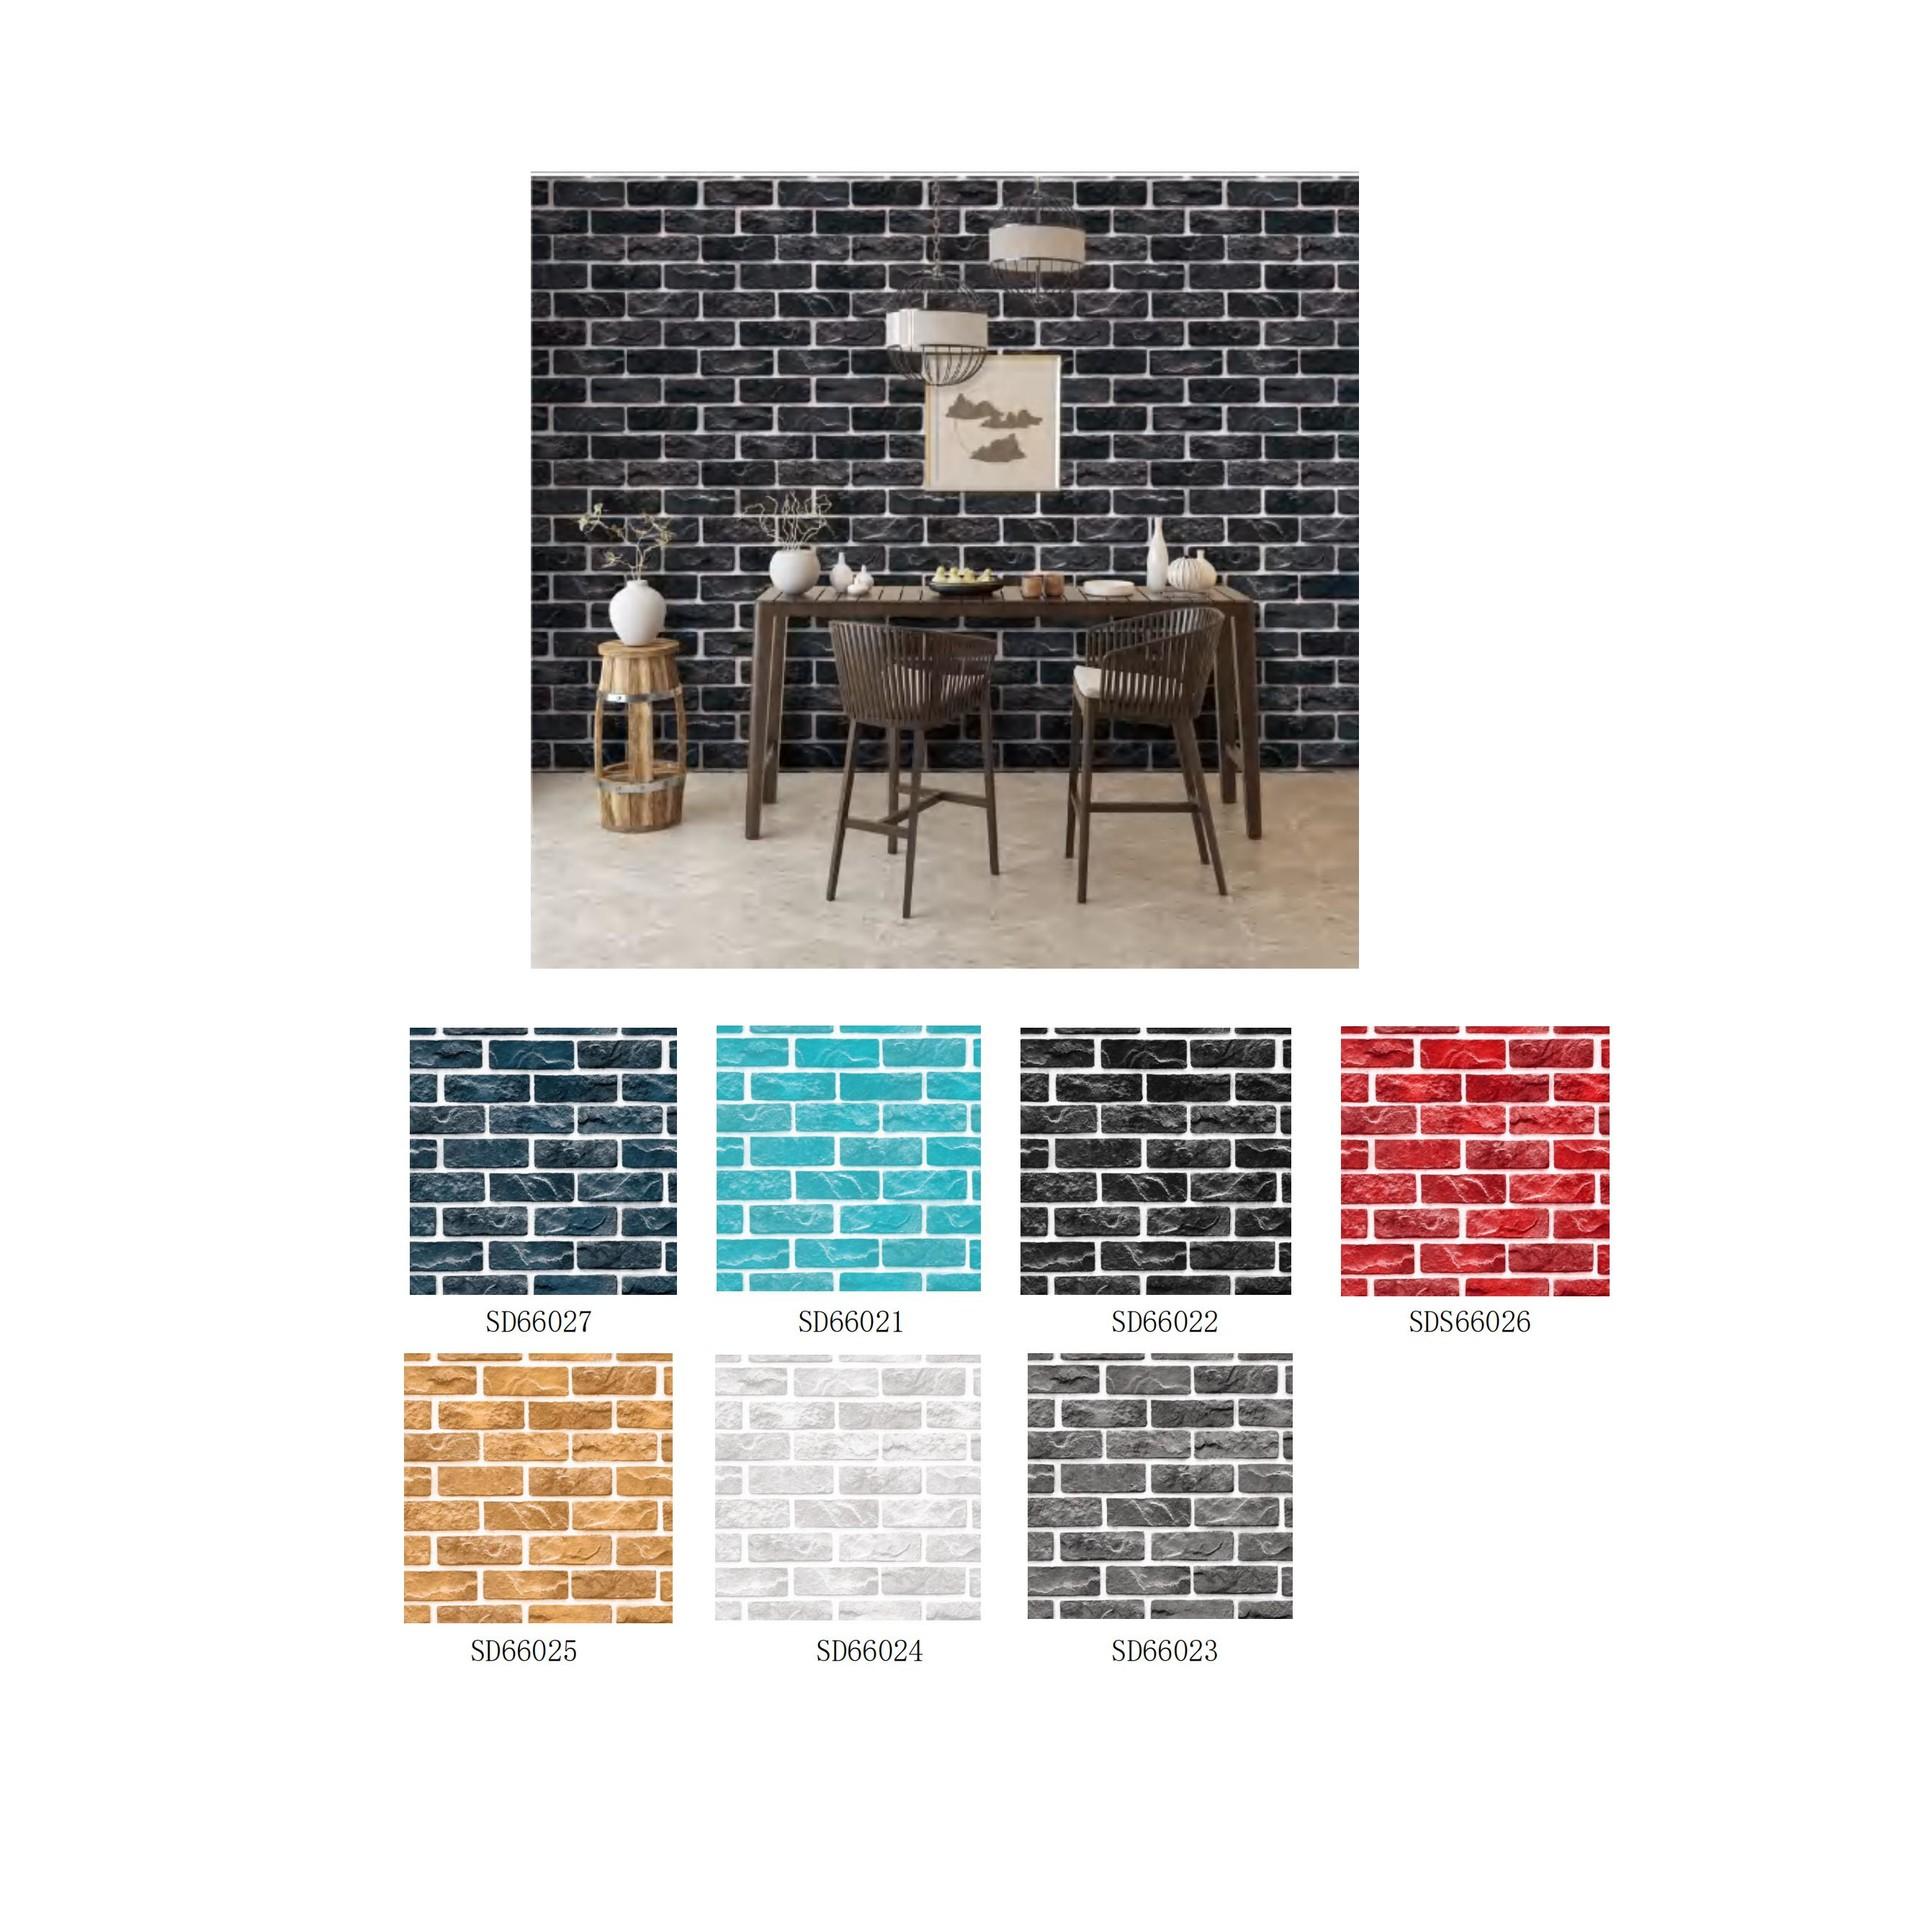 Brick design self adhesive pvc 3d decorative wallpaper